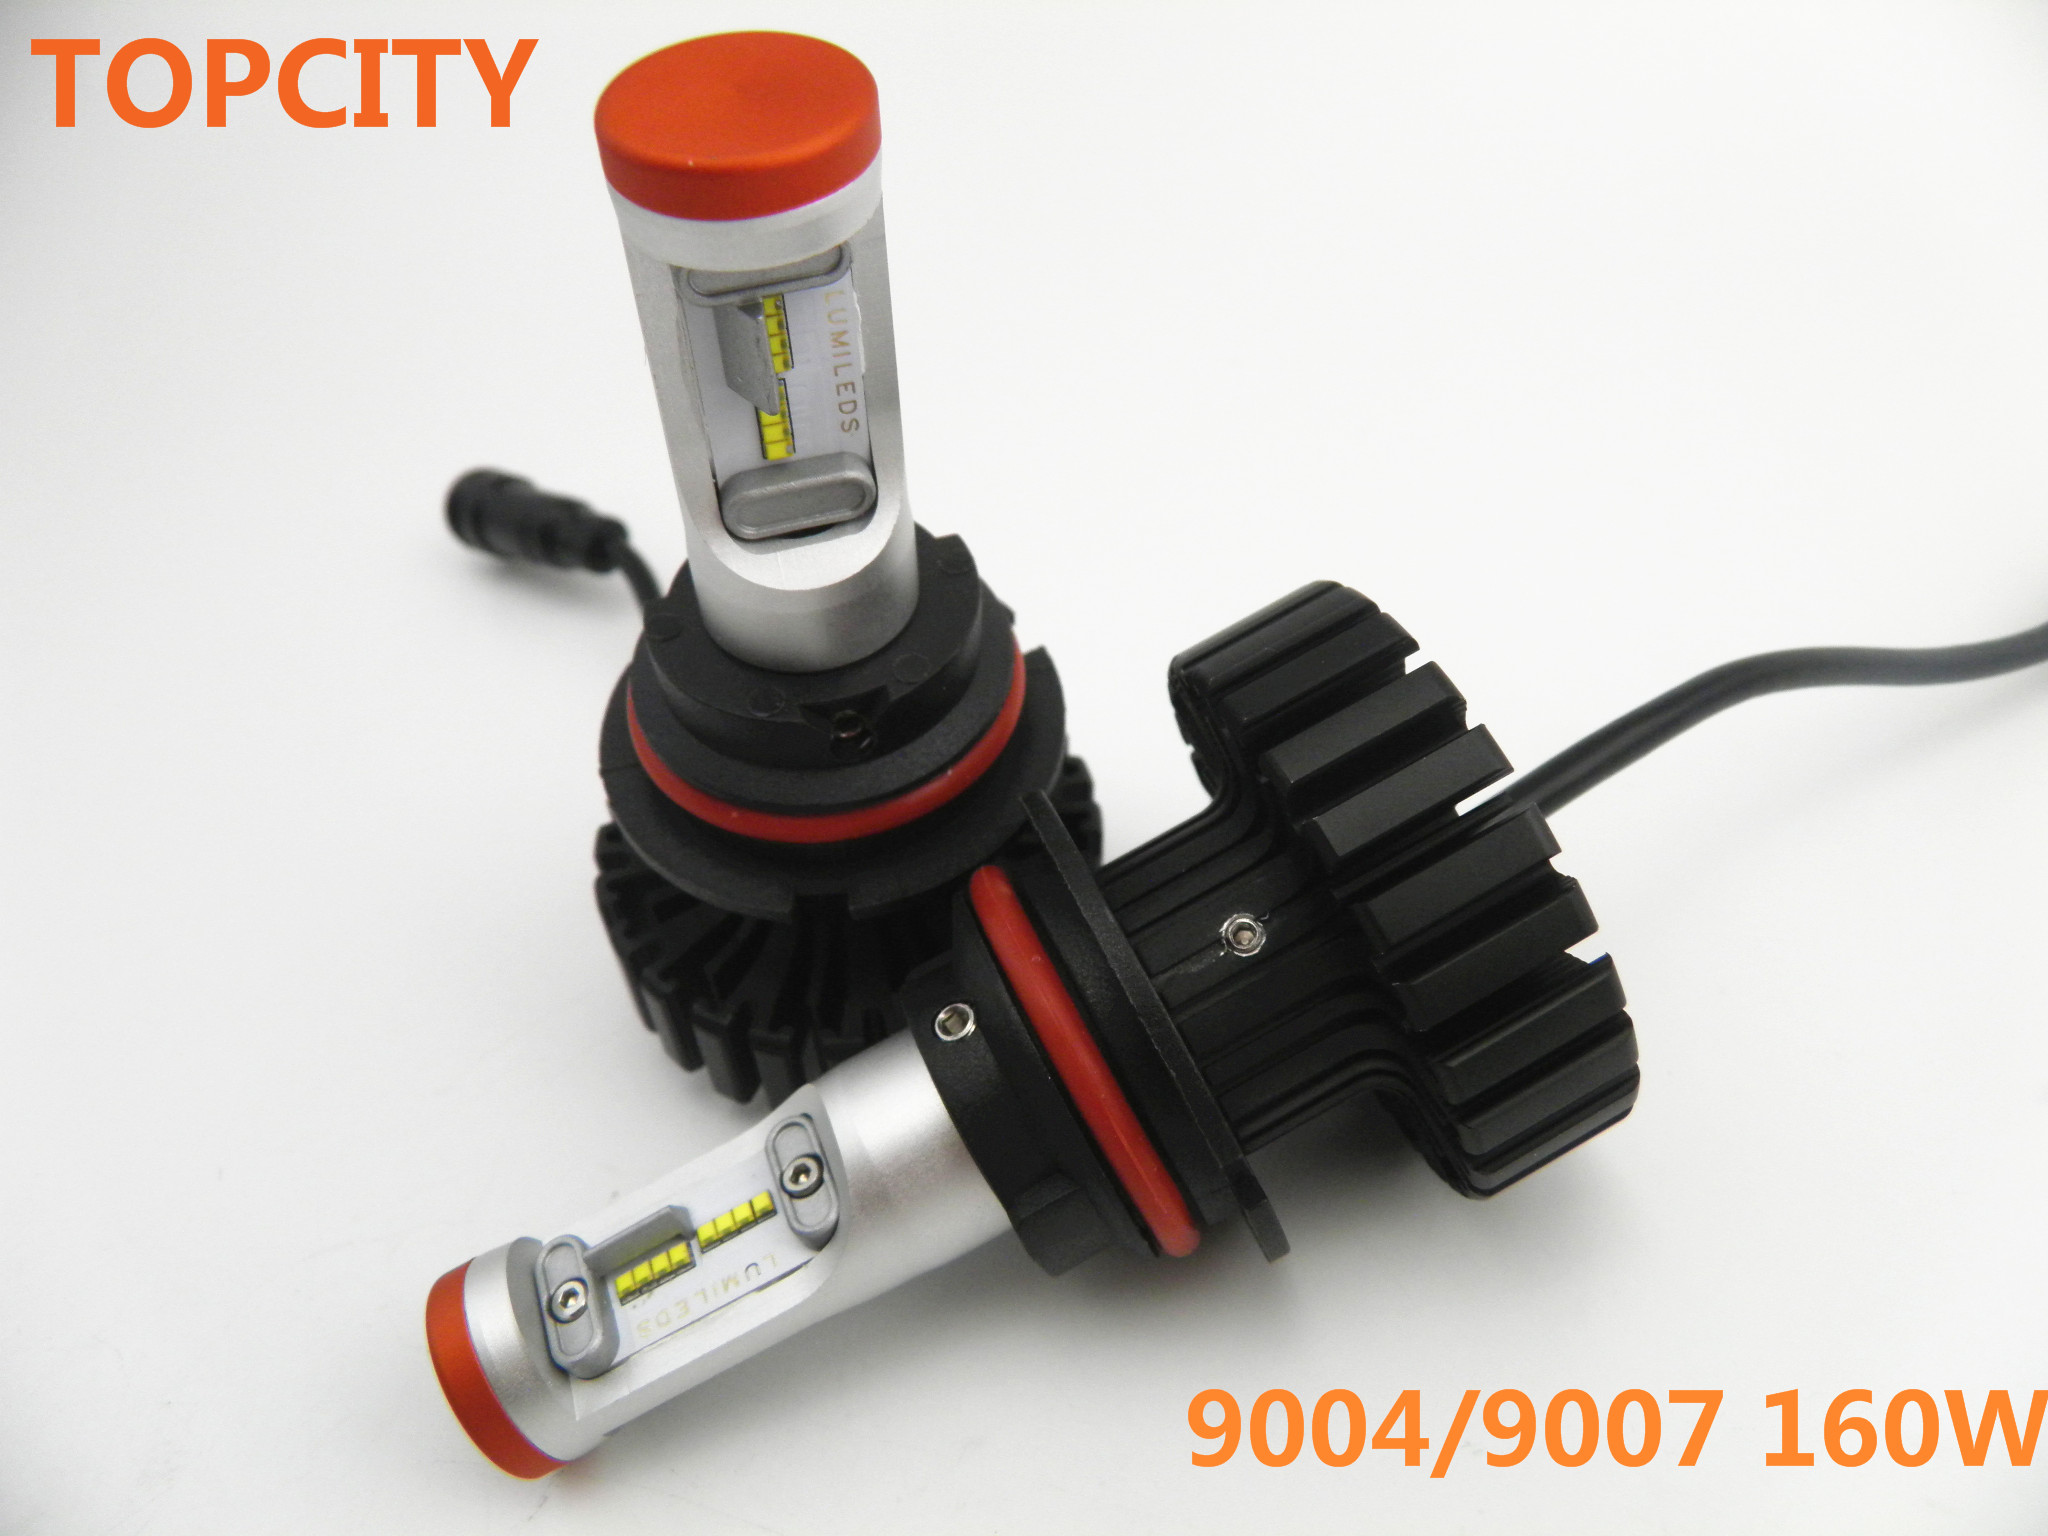 Topcity LED 160W Conversion Kit 9004 High Low Beam Headlight 9007 Headlamp9004/9007Hi/Lo